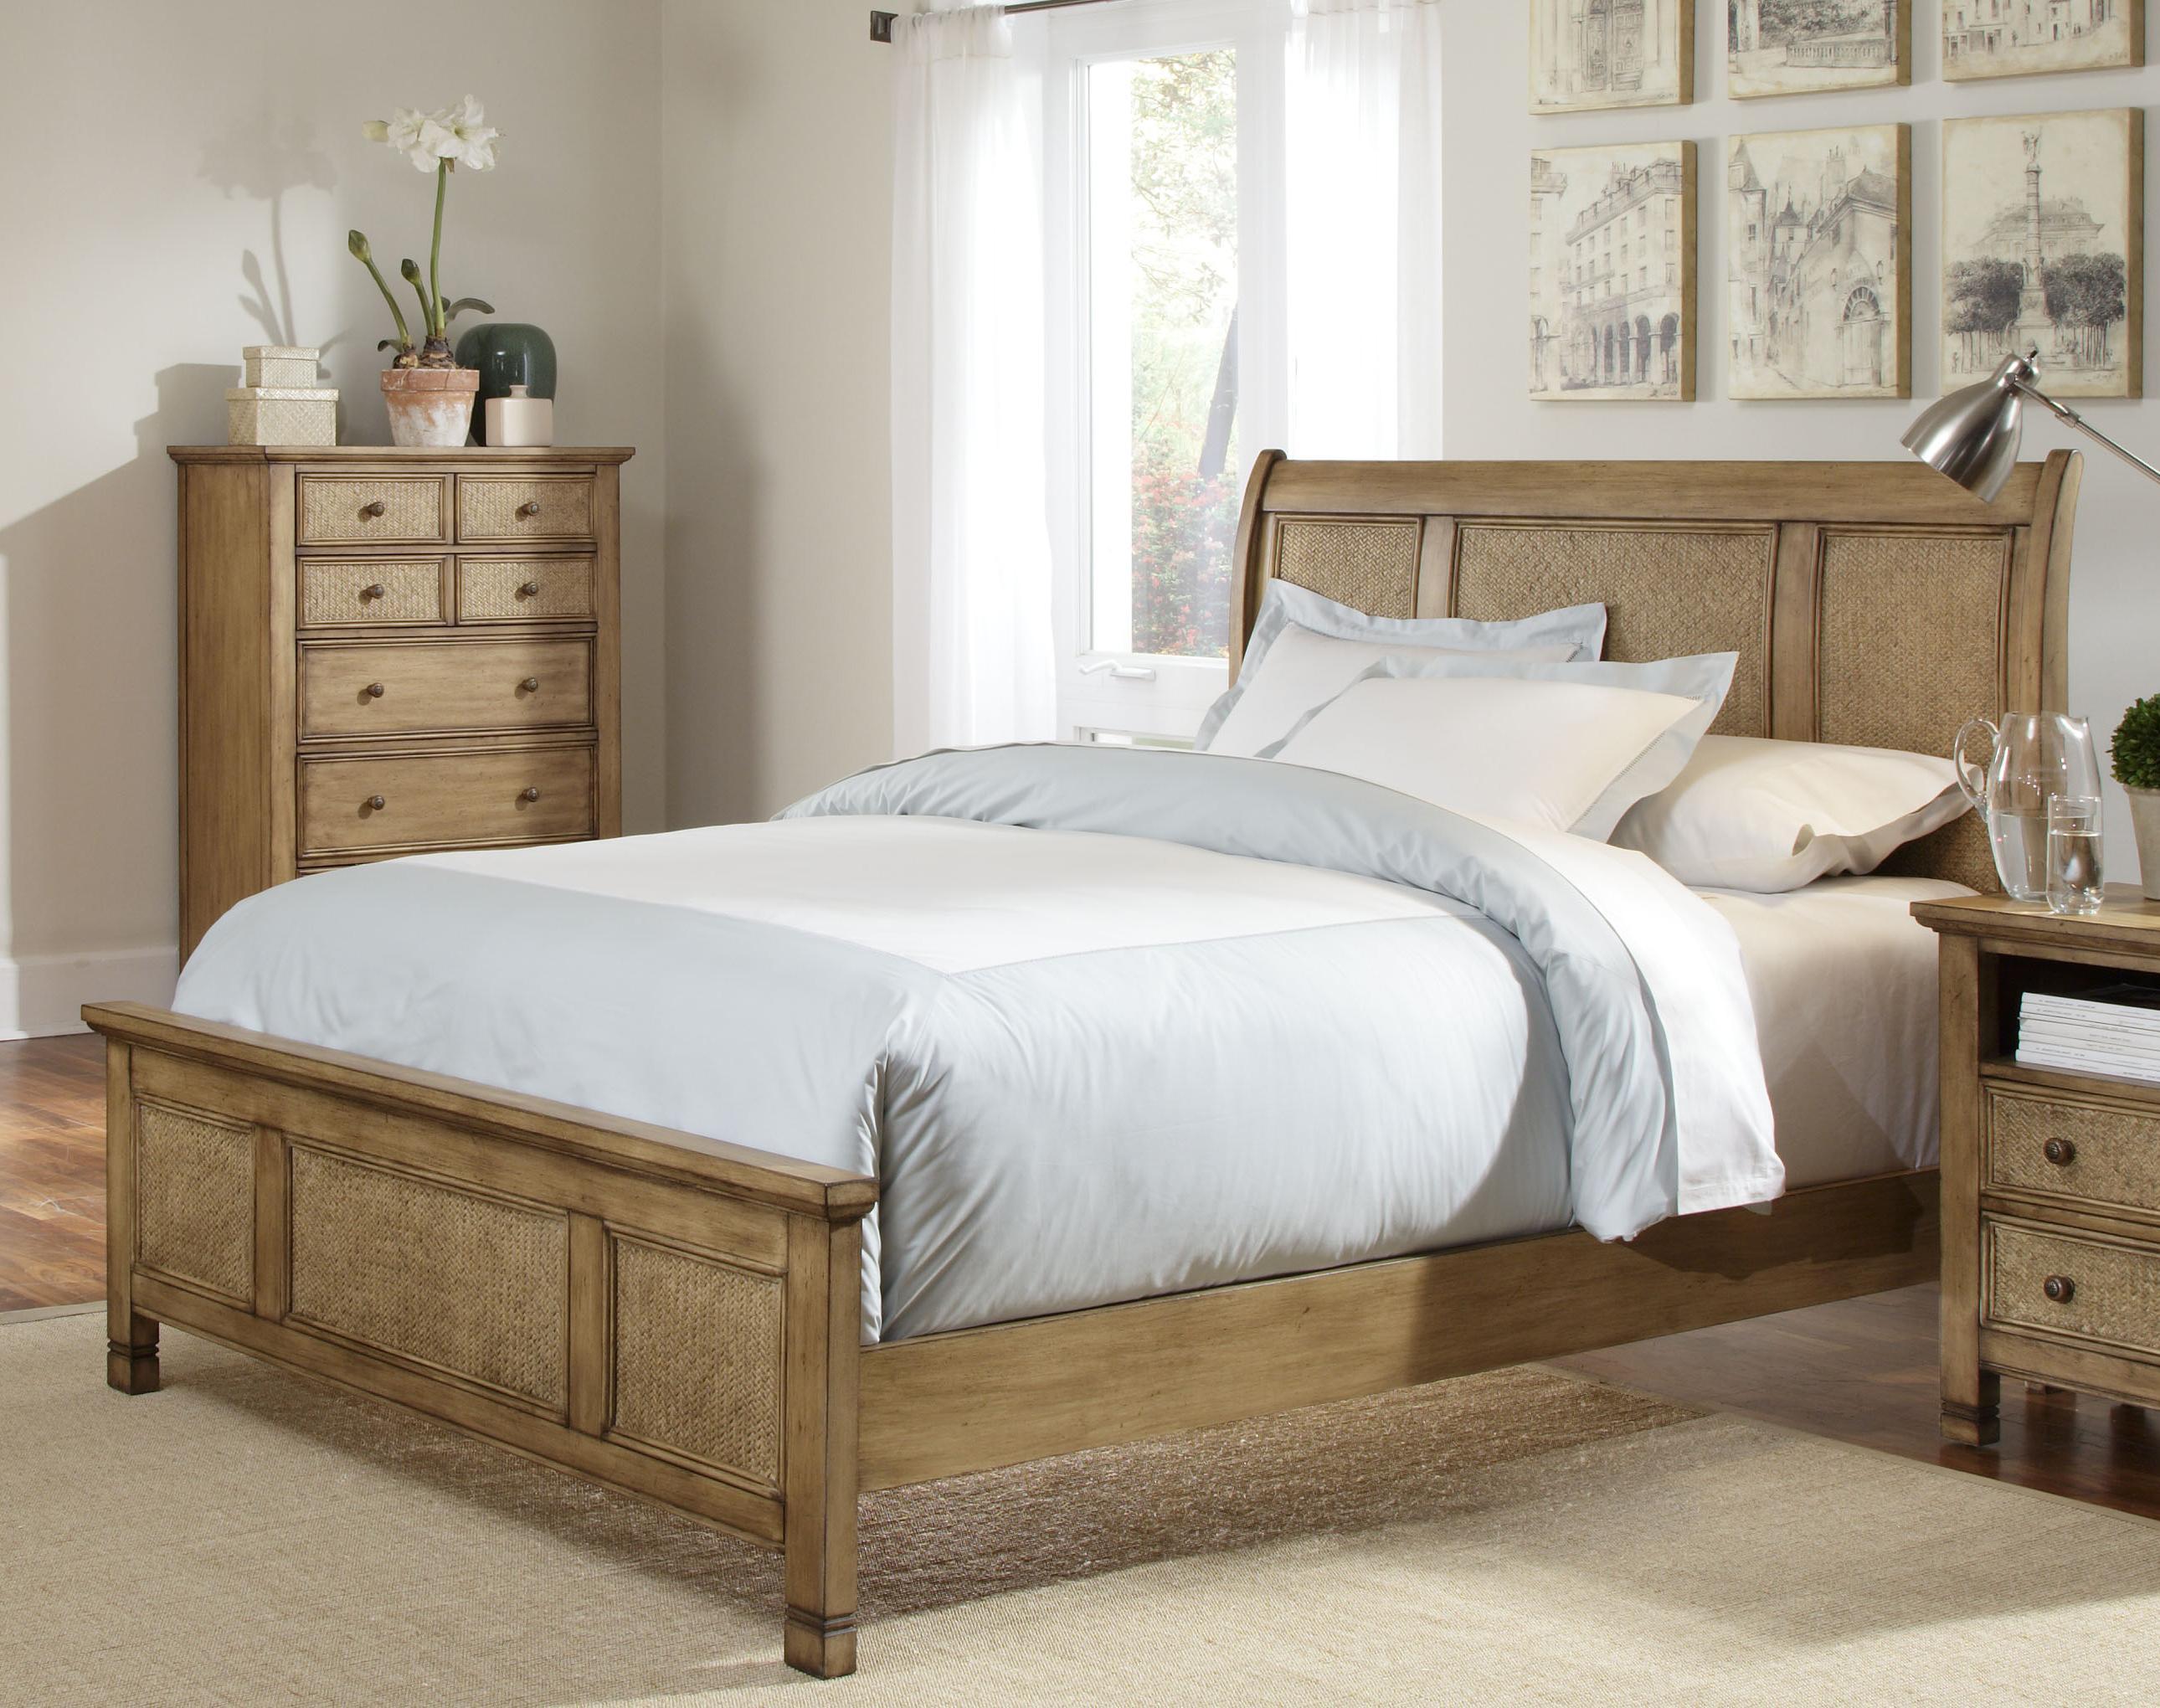 Progressive Furniture Kingston Isle King Sleigh/Platform Bed - Item Number: P196-90+1+83